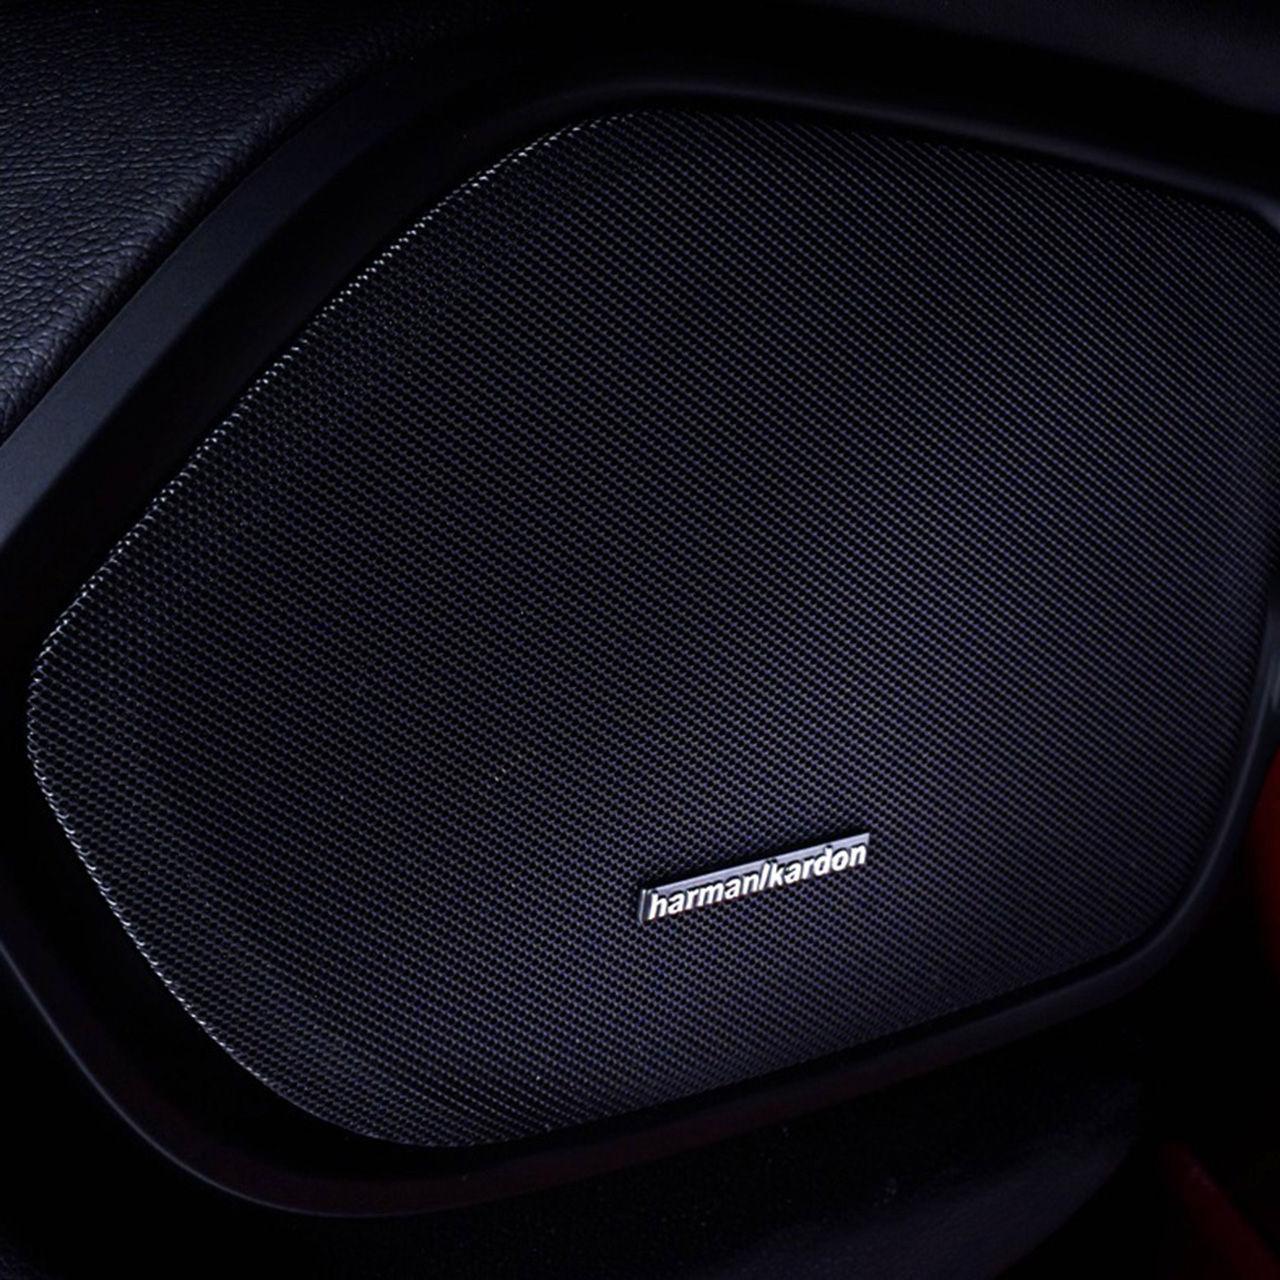 Harman Kardon Lautspreche in Maserati - Detailansicht 3